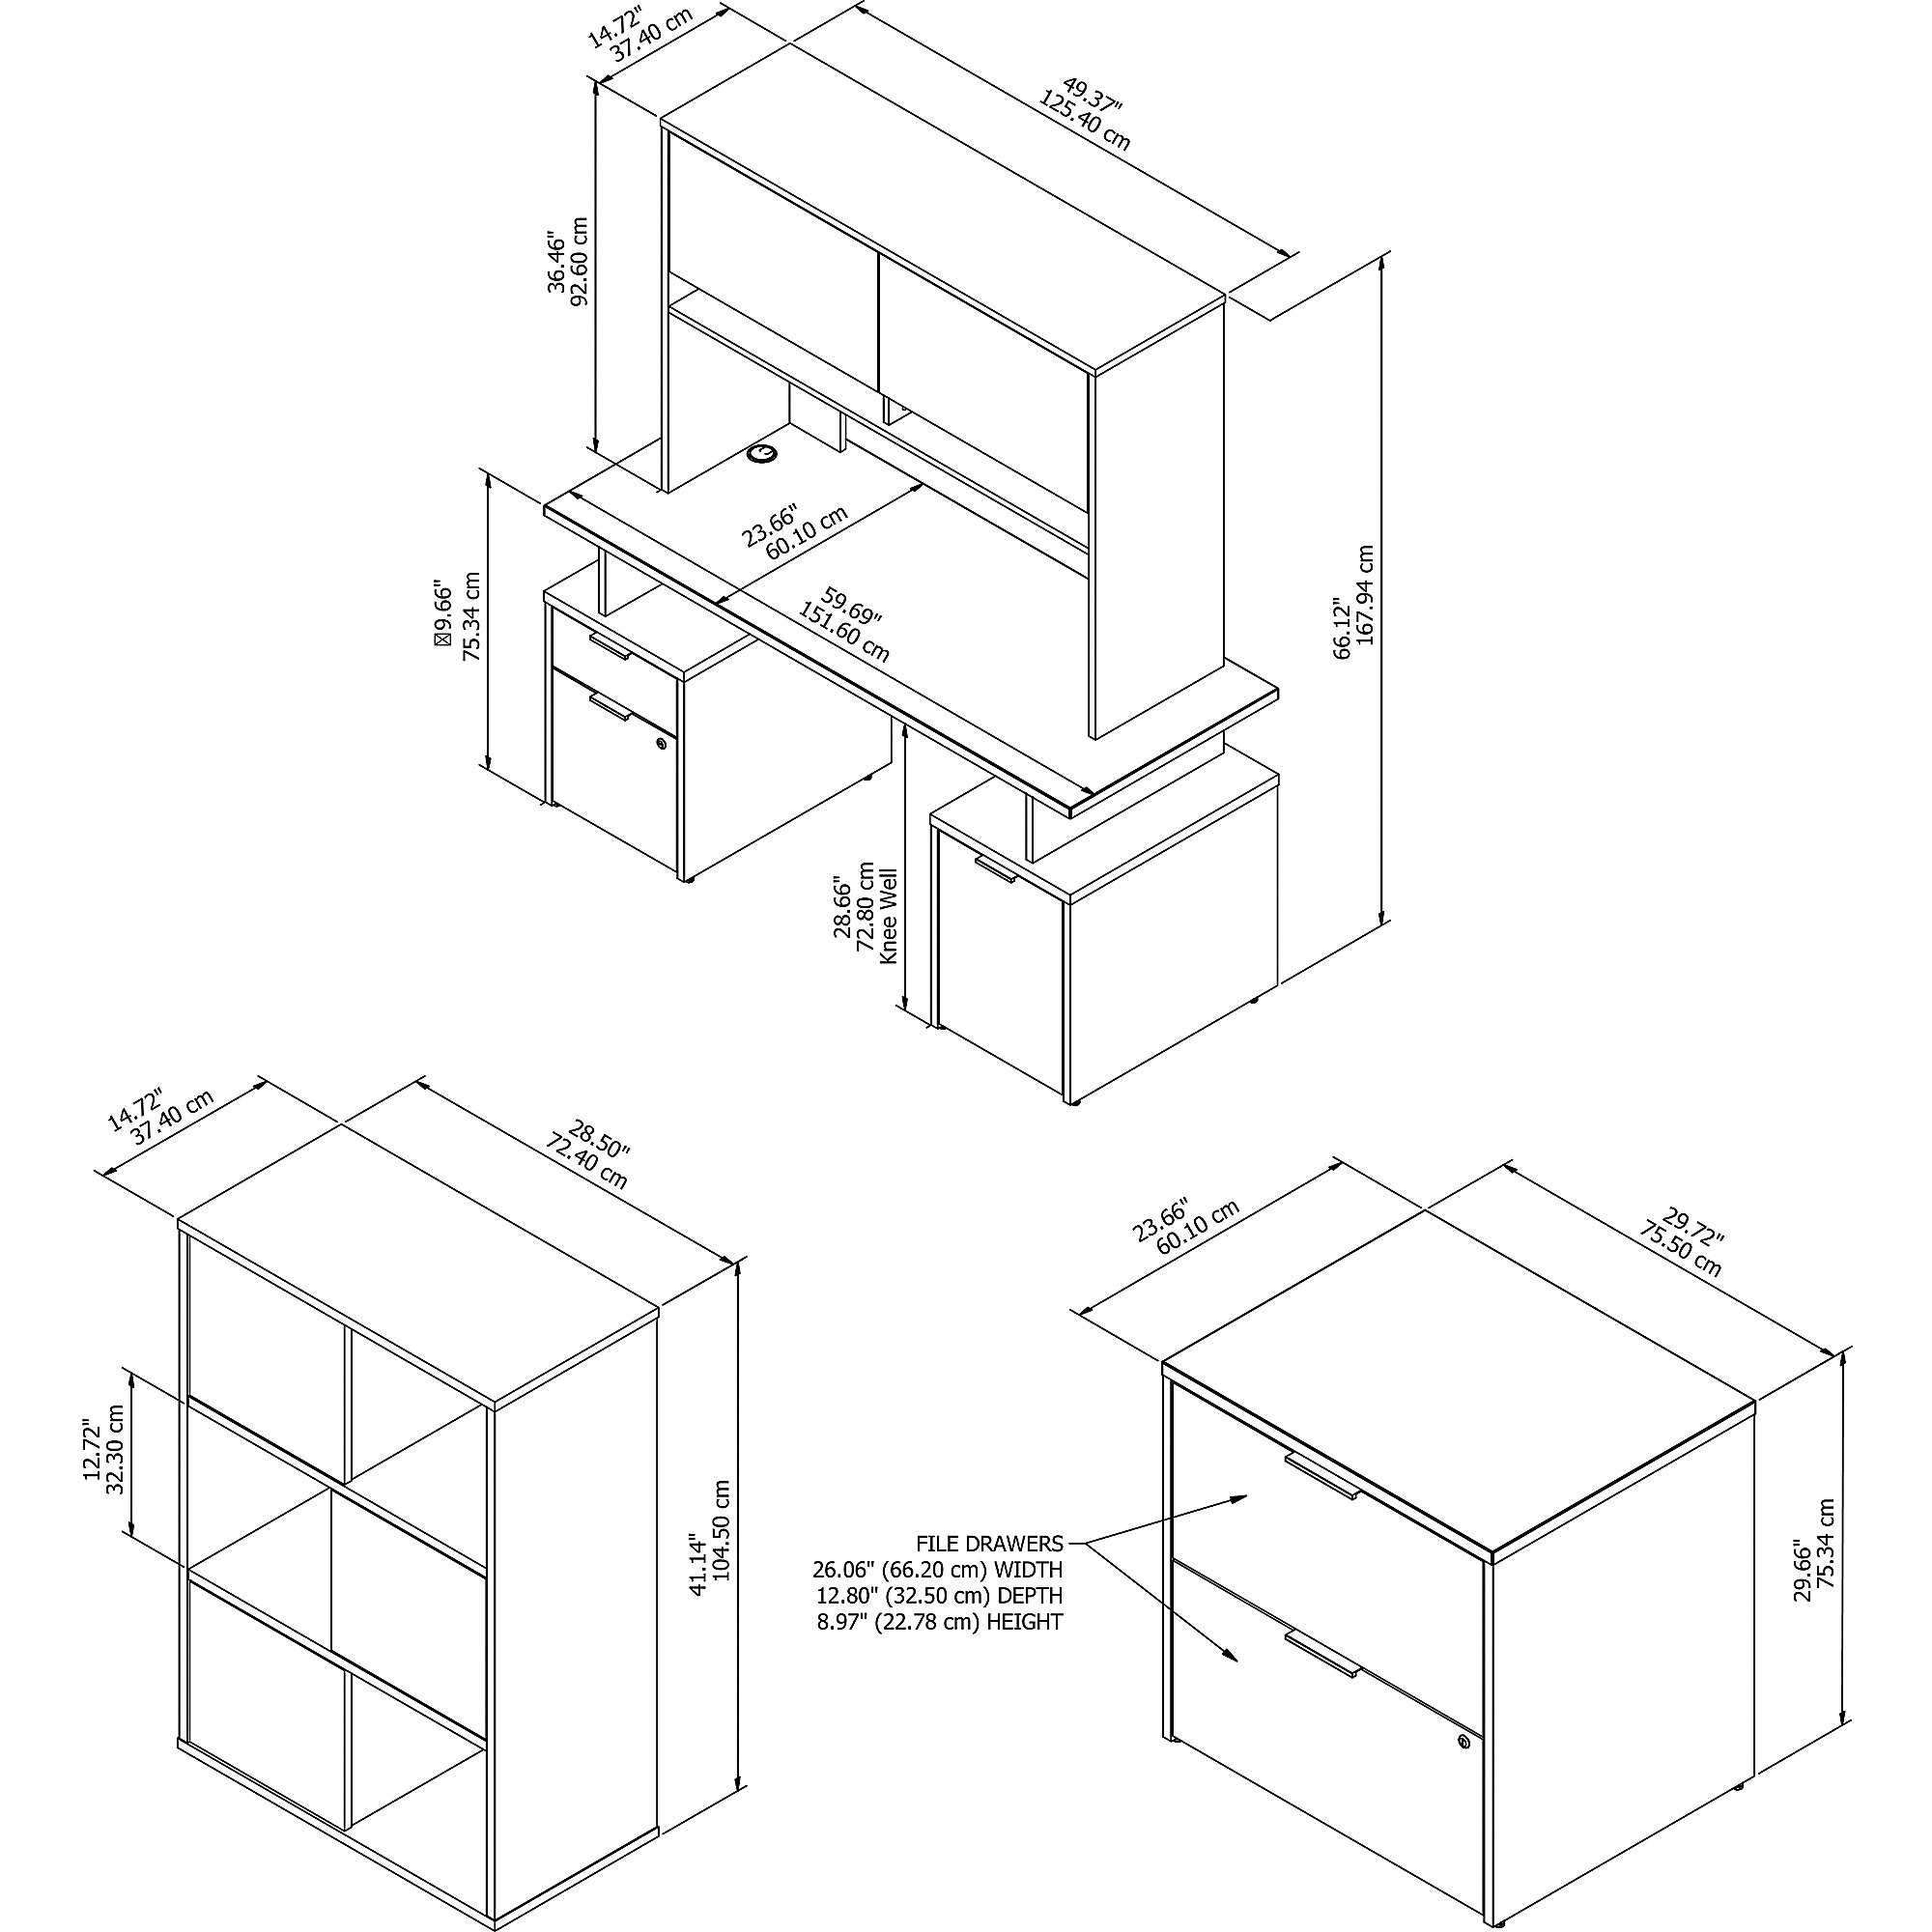 jamestown jtn020 component dimensions